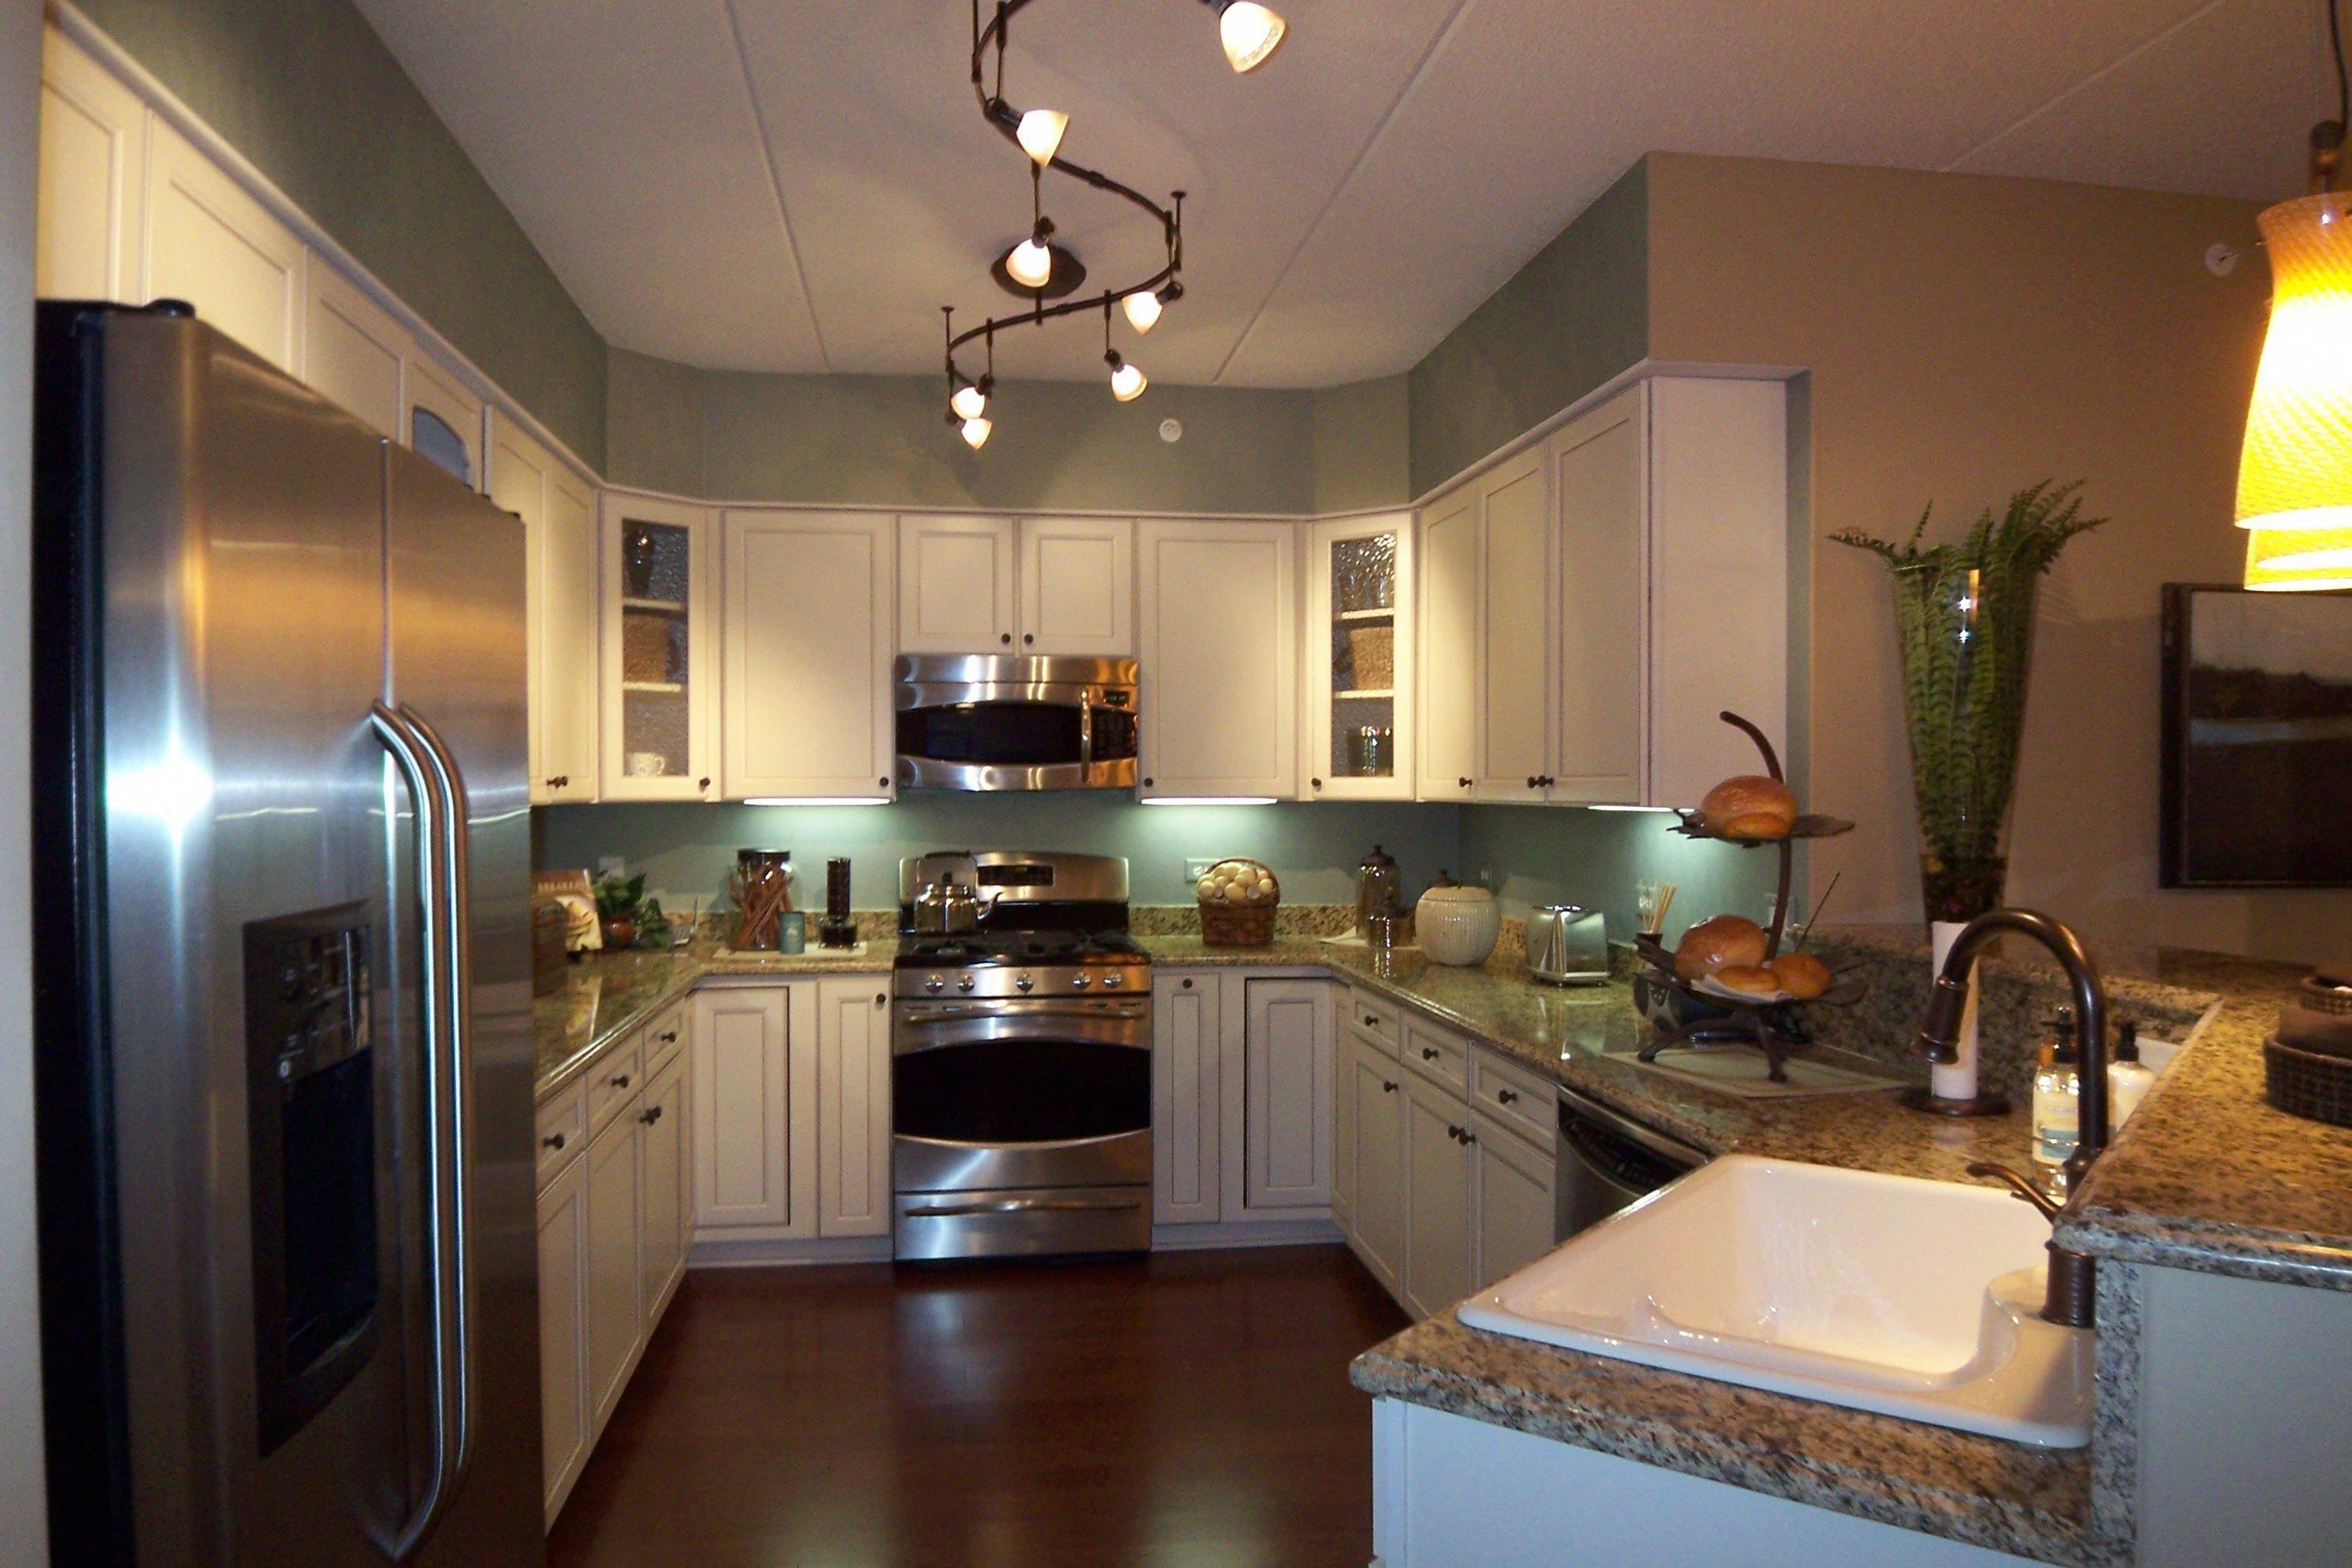 Kitchen Lighting Ideas With No Island Countertops Kitchenlightingideas2018 Trackhomeremod Best Kitchen Lighting Kitchen Ceiling Lights Track Lighting Kitchen Kitchen lighting ideas no island